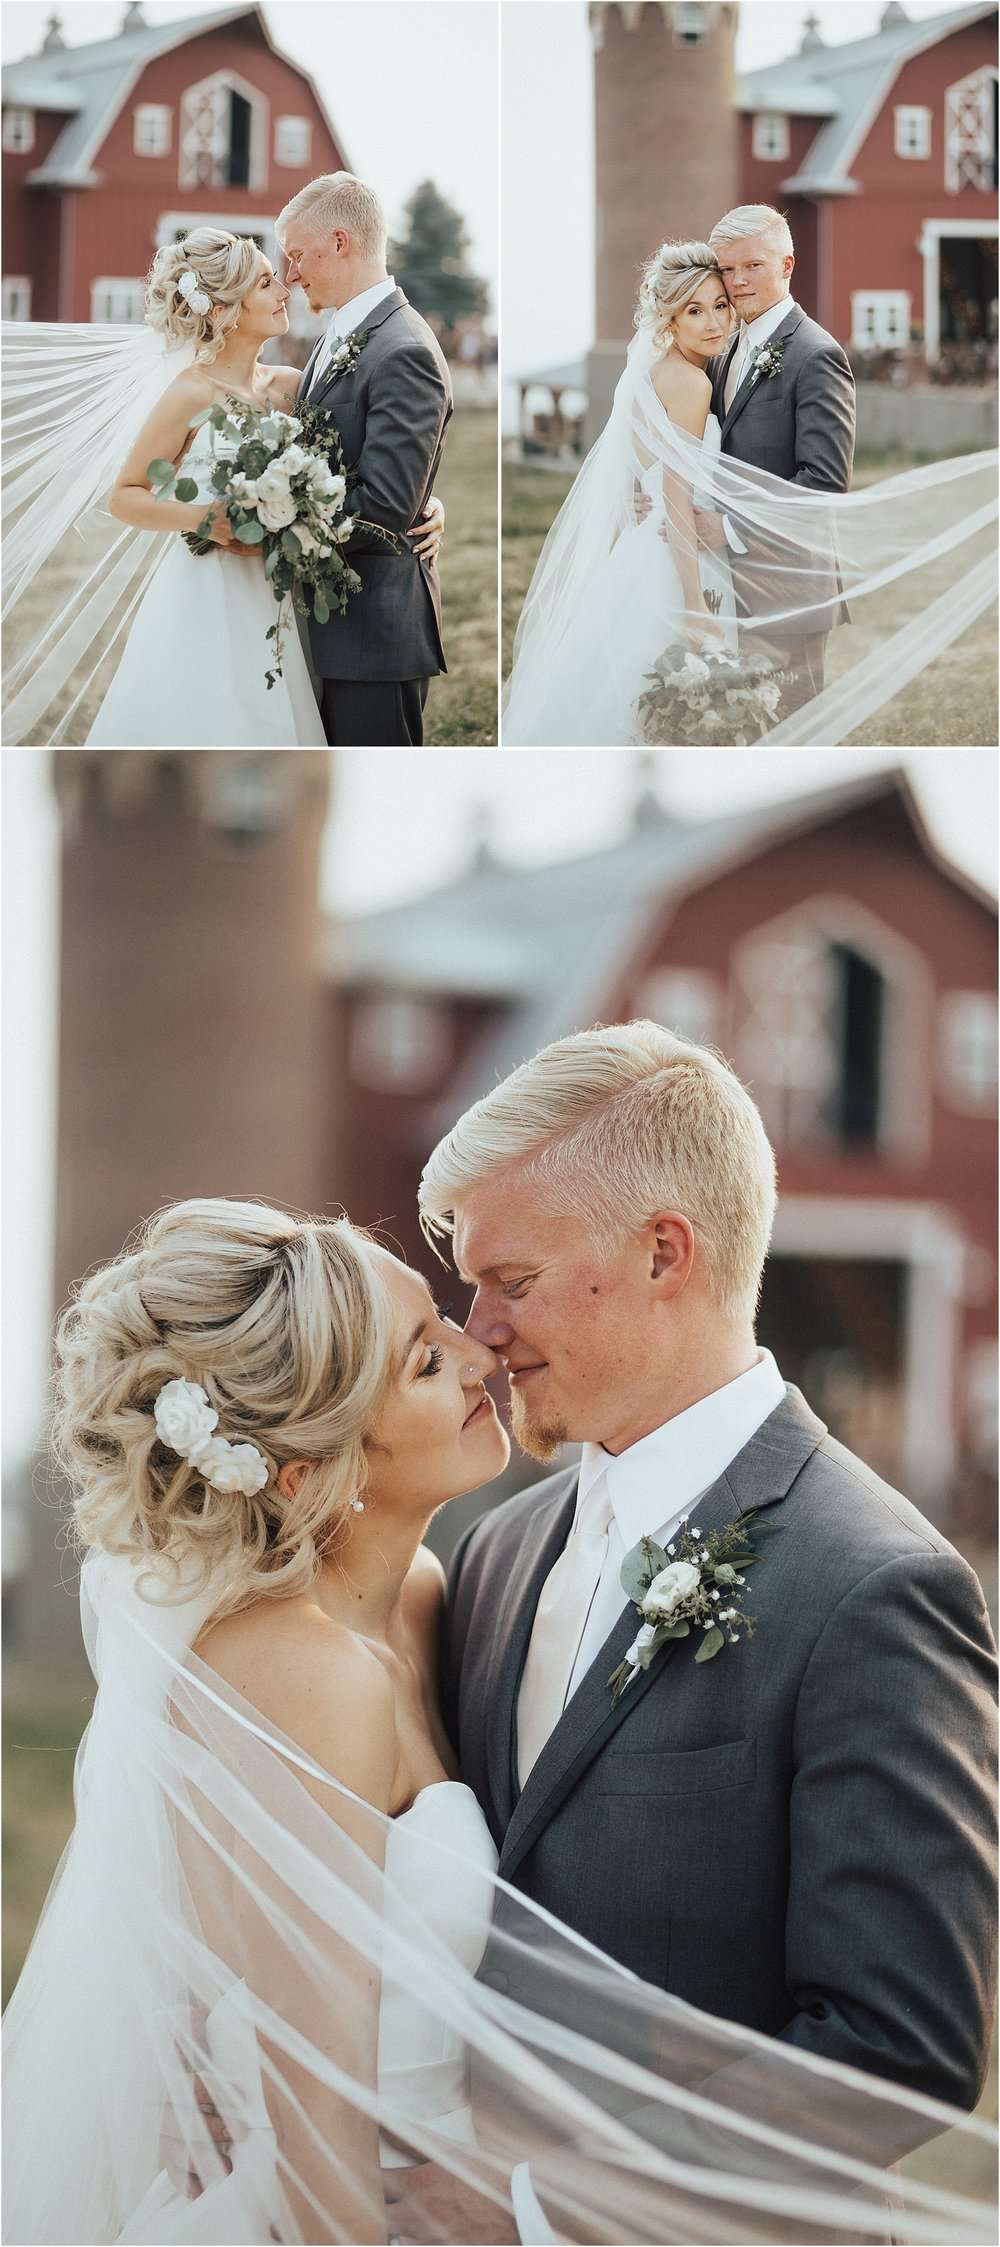 Belles on the Bluff Greenbluff Spokane Wedding Photography_0013.jpg